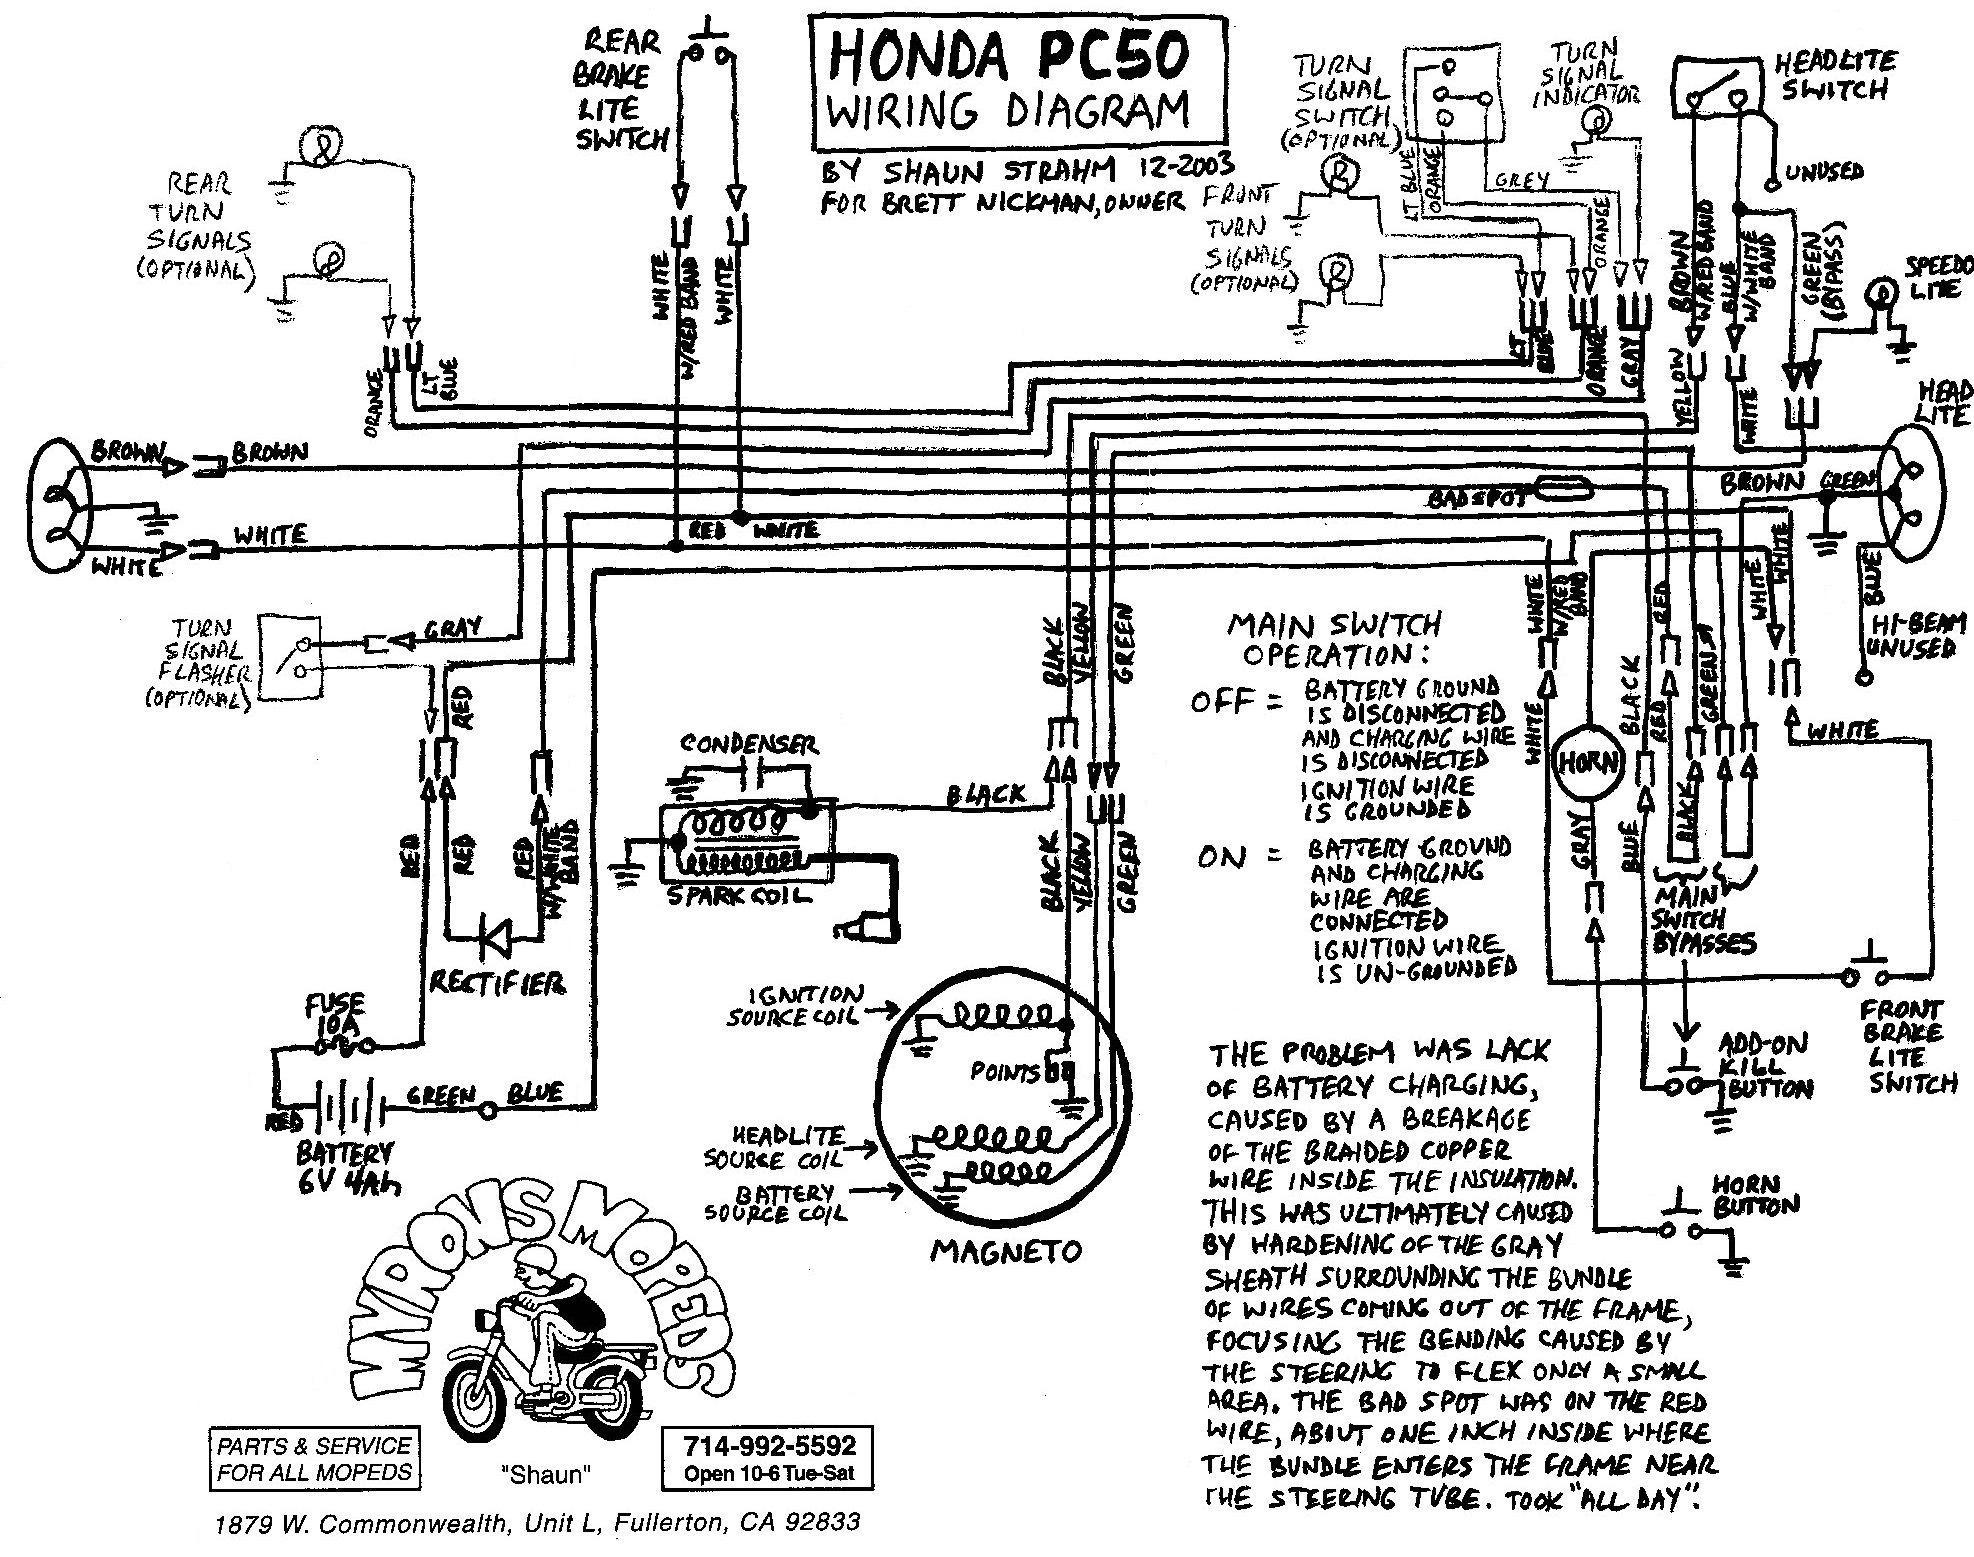 Diagram Wiring Diagram Honda Dio Full Version Hd Quality Honda Dio Diagramstana Dolcialchimie It